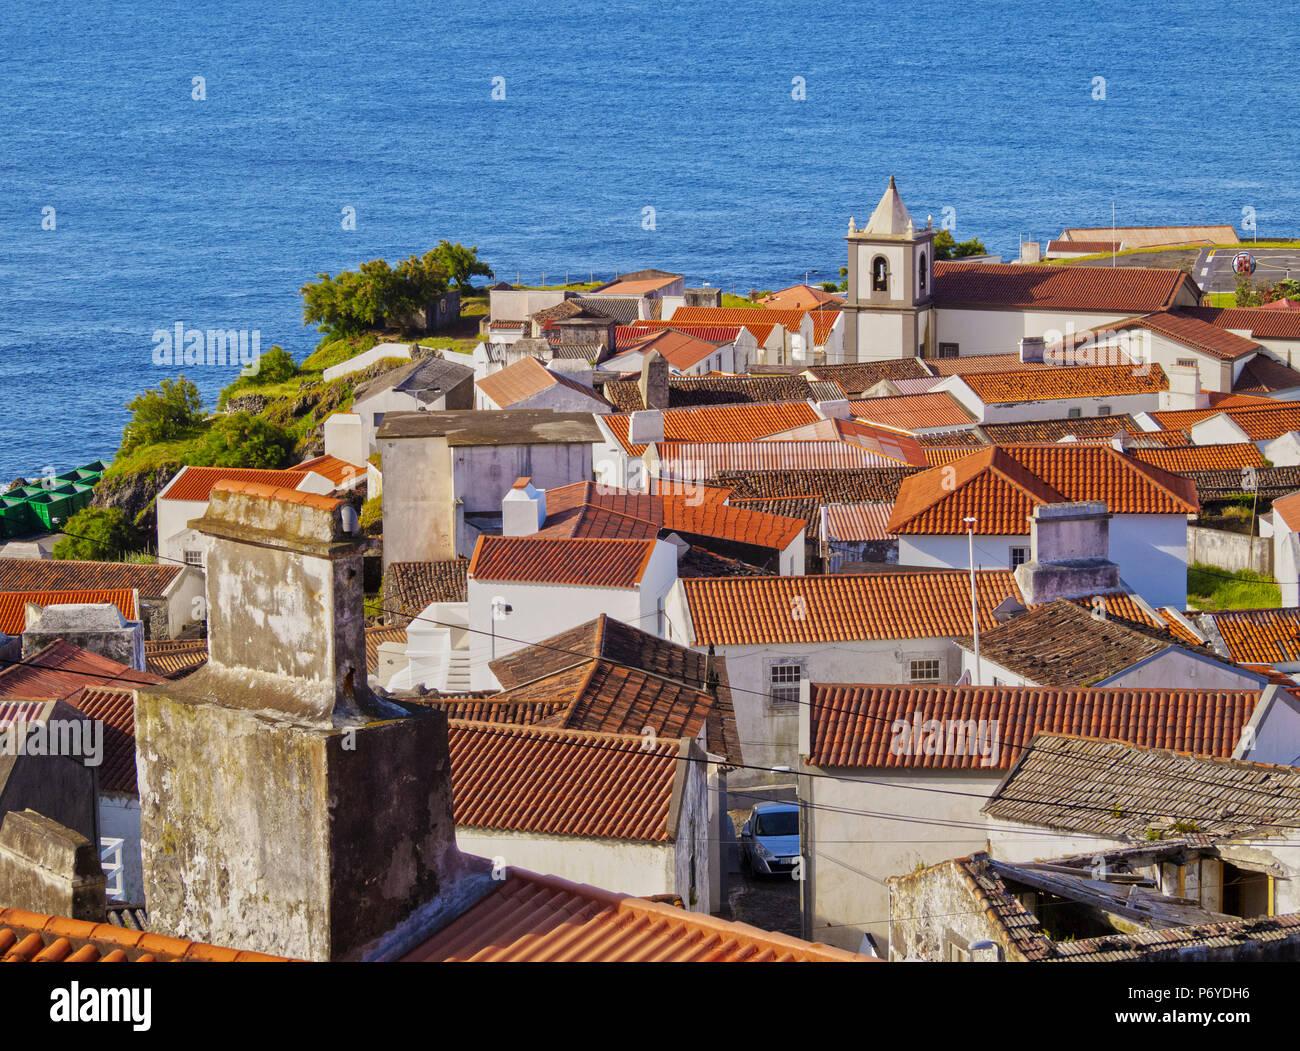 Portugal, Azores, Corvo, Vila do Corvo, Elevated view of the town. - Stock Image